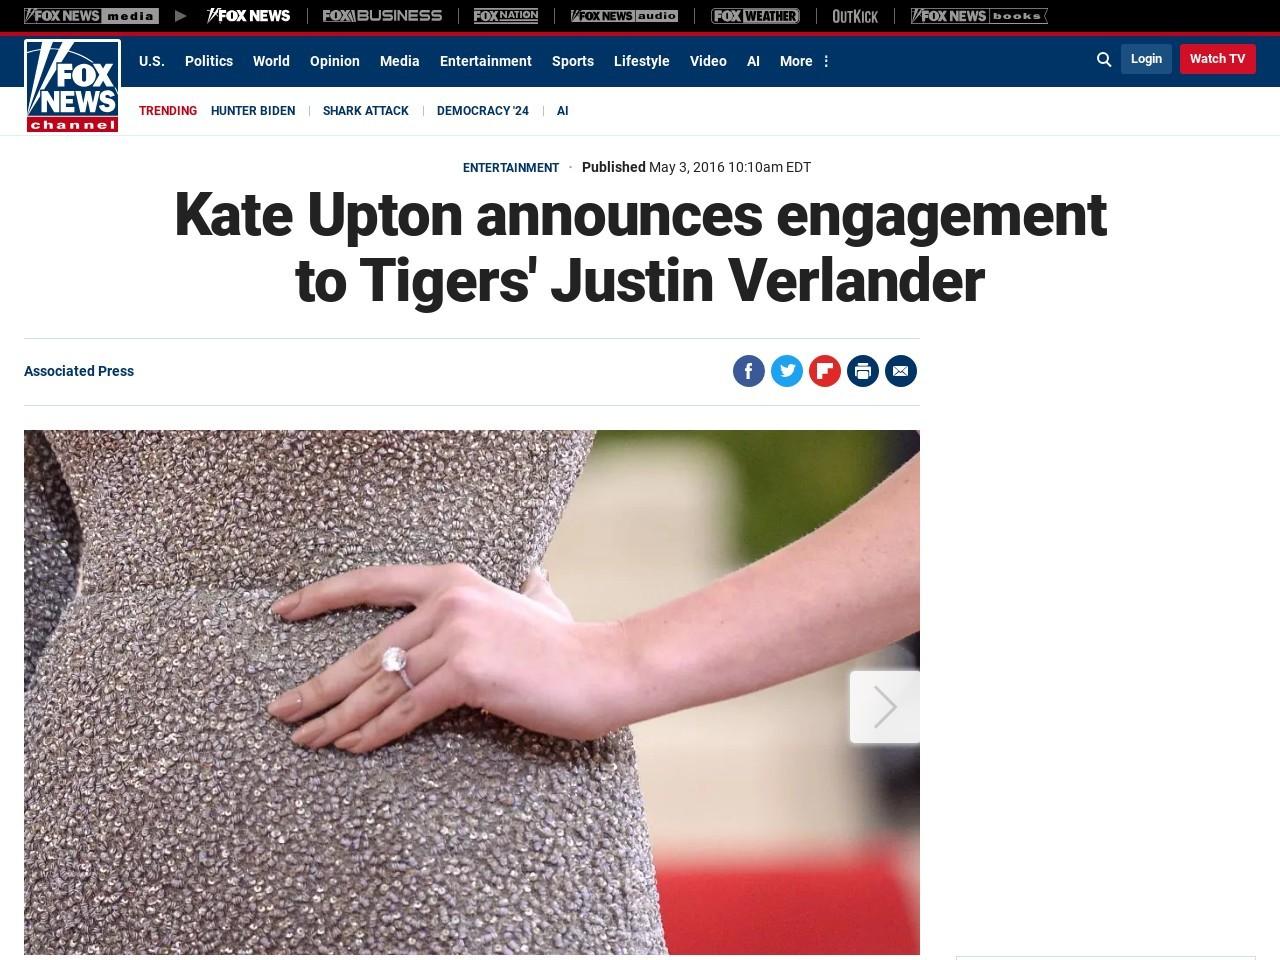 Kate Upton has huge news